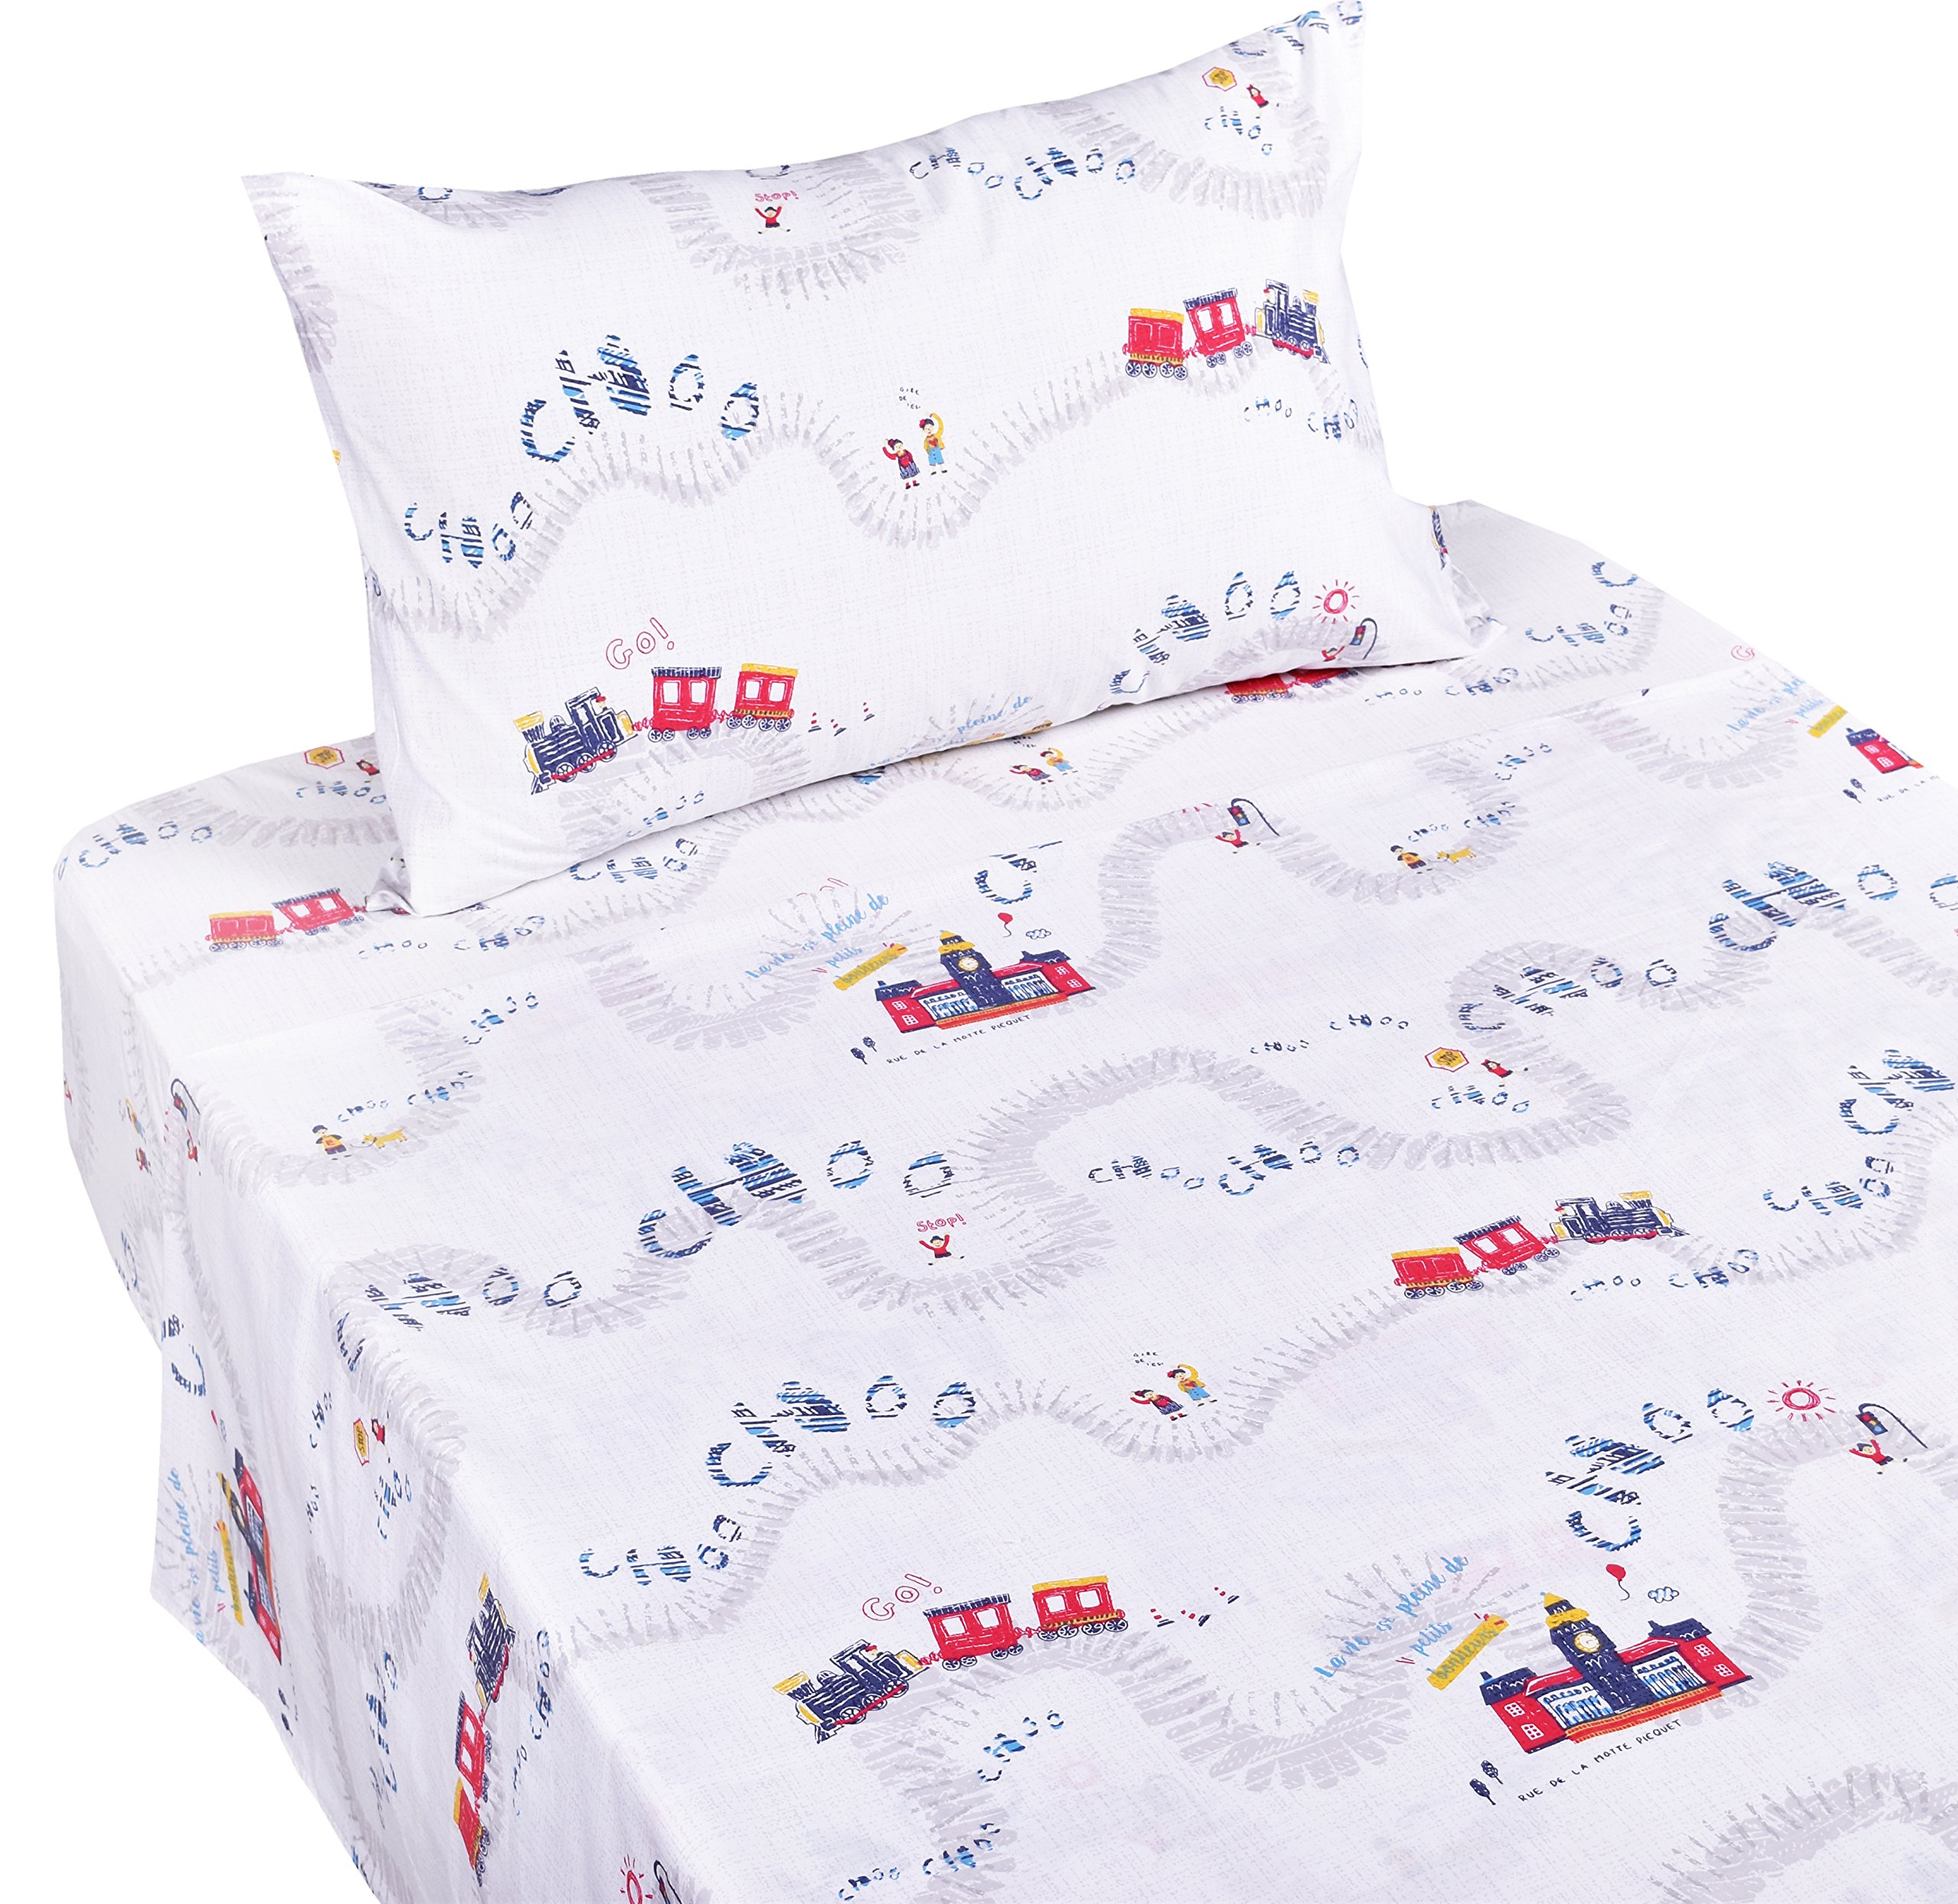 J-pinno Train Travel Twin Sheet Set for Kids Boy Children,100% Cotton, Flat Sheet + Fitted Sheet + Pillowcase Bedding Set